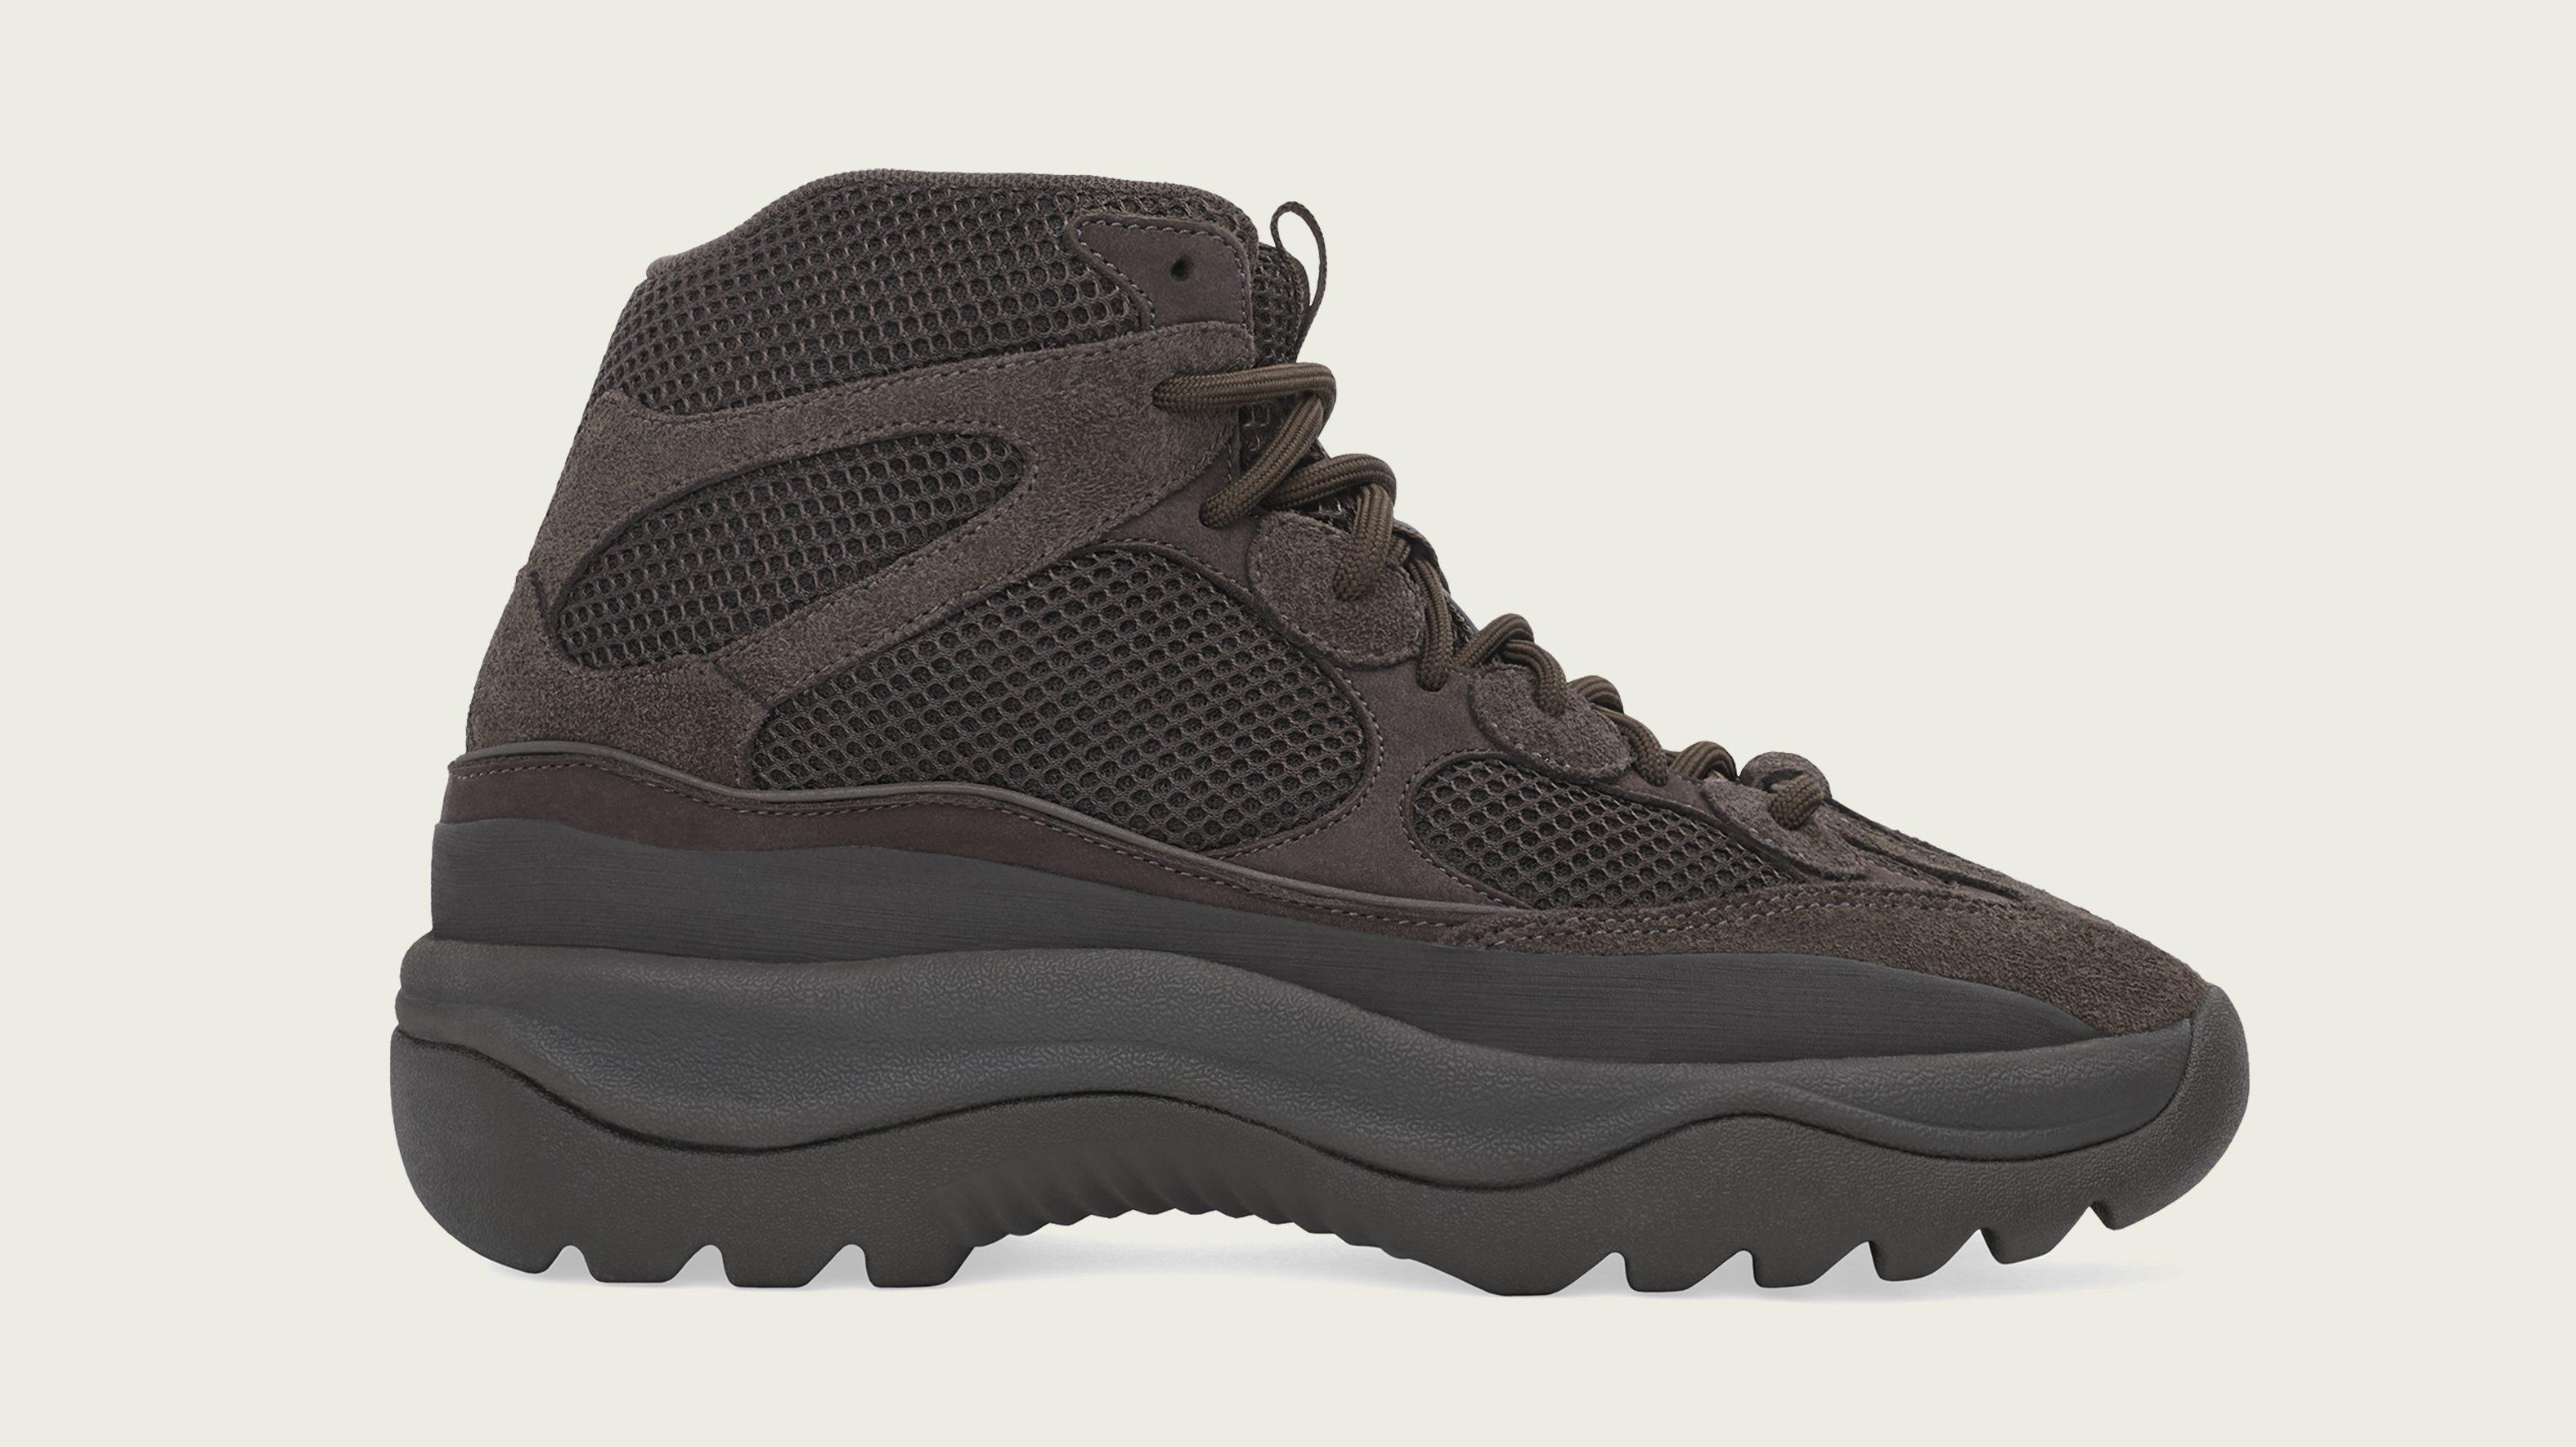 Yeezy Desert Boot 'Oil' Release Info